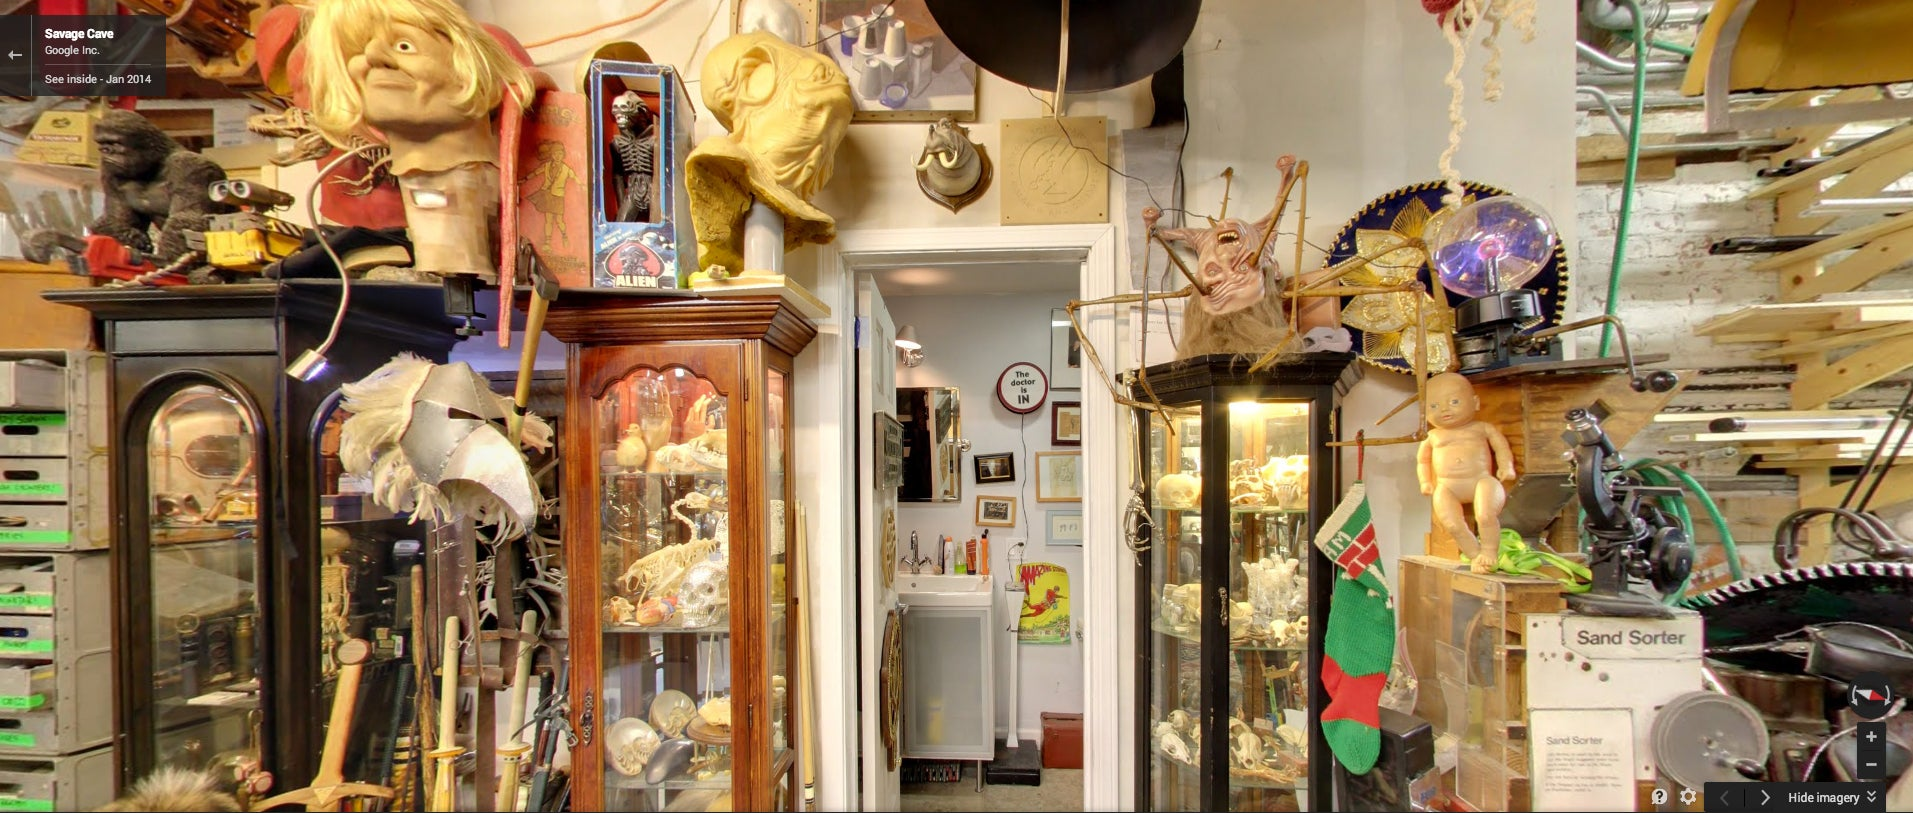 Walk Around Adam Savage's Mini-Museum on Google Street View